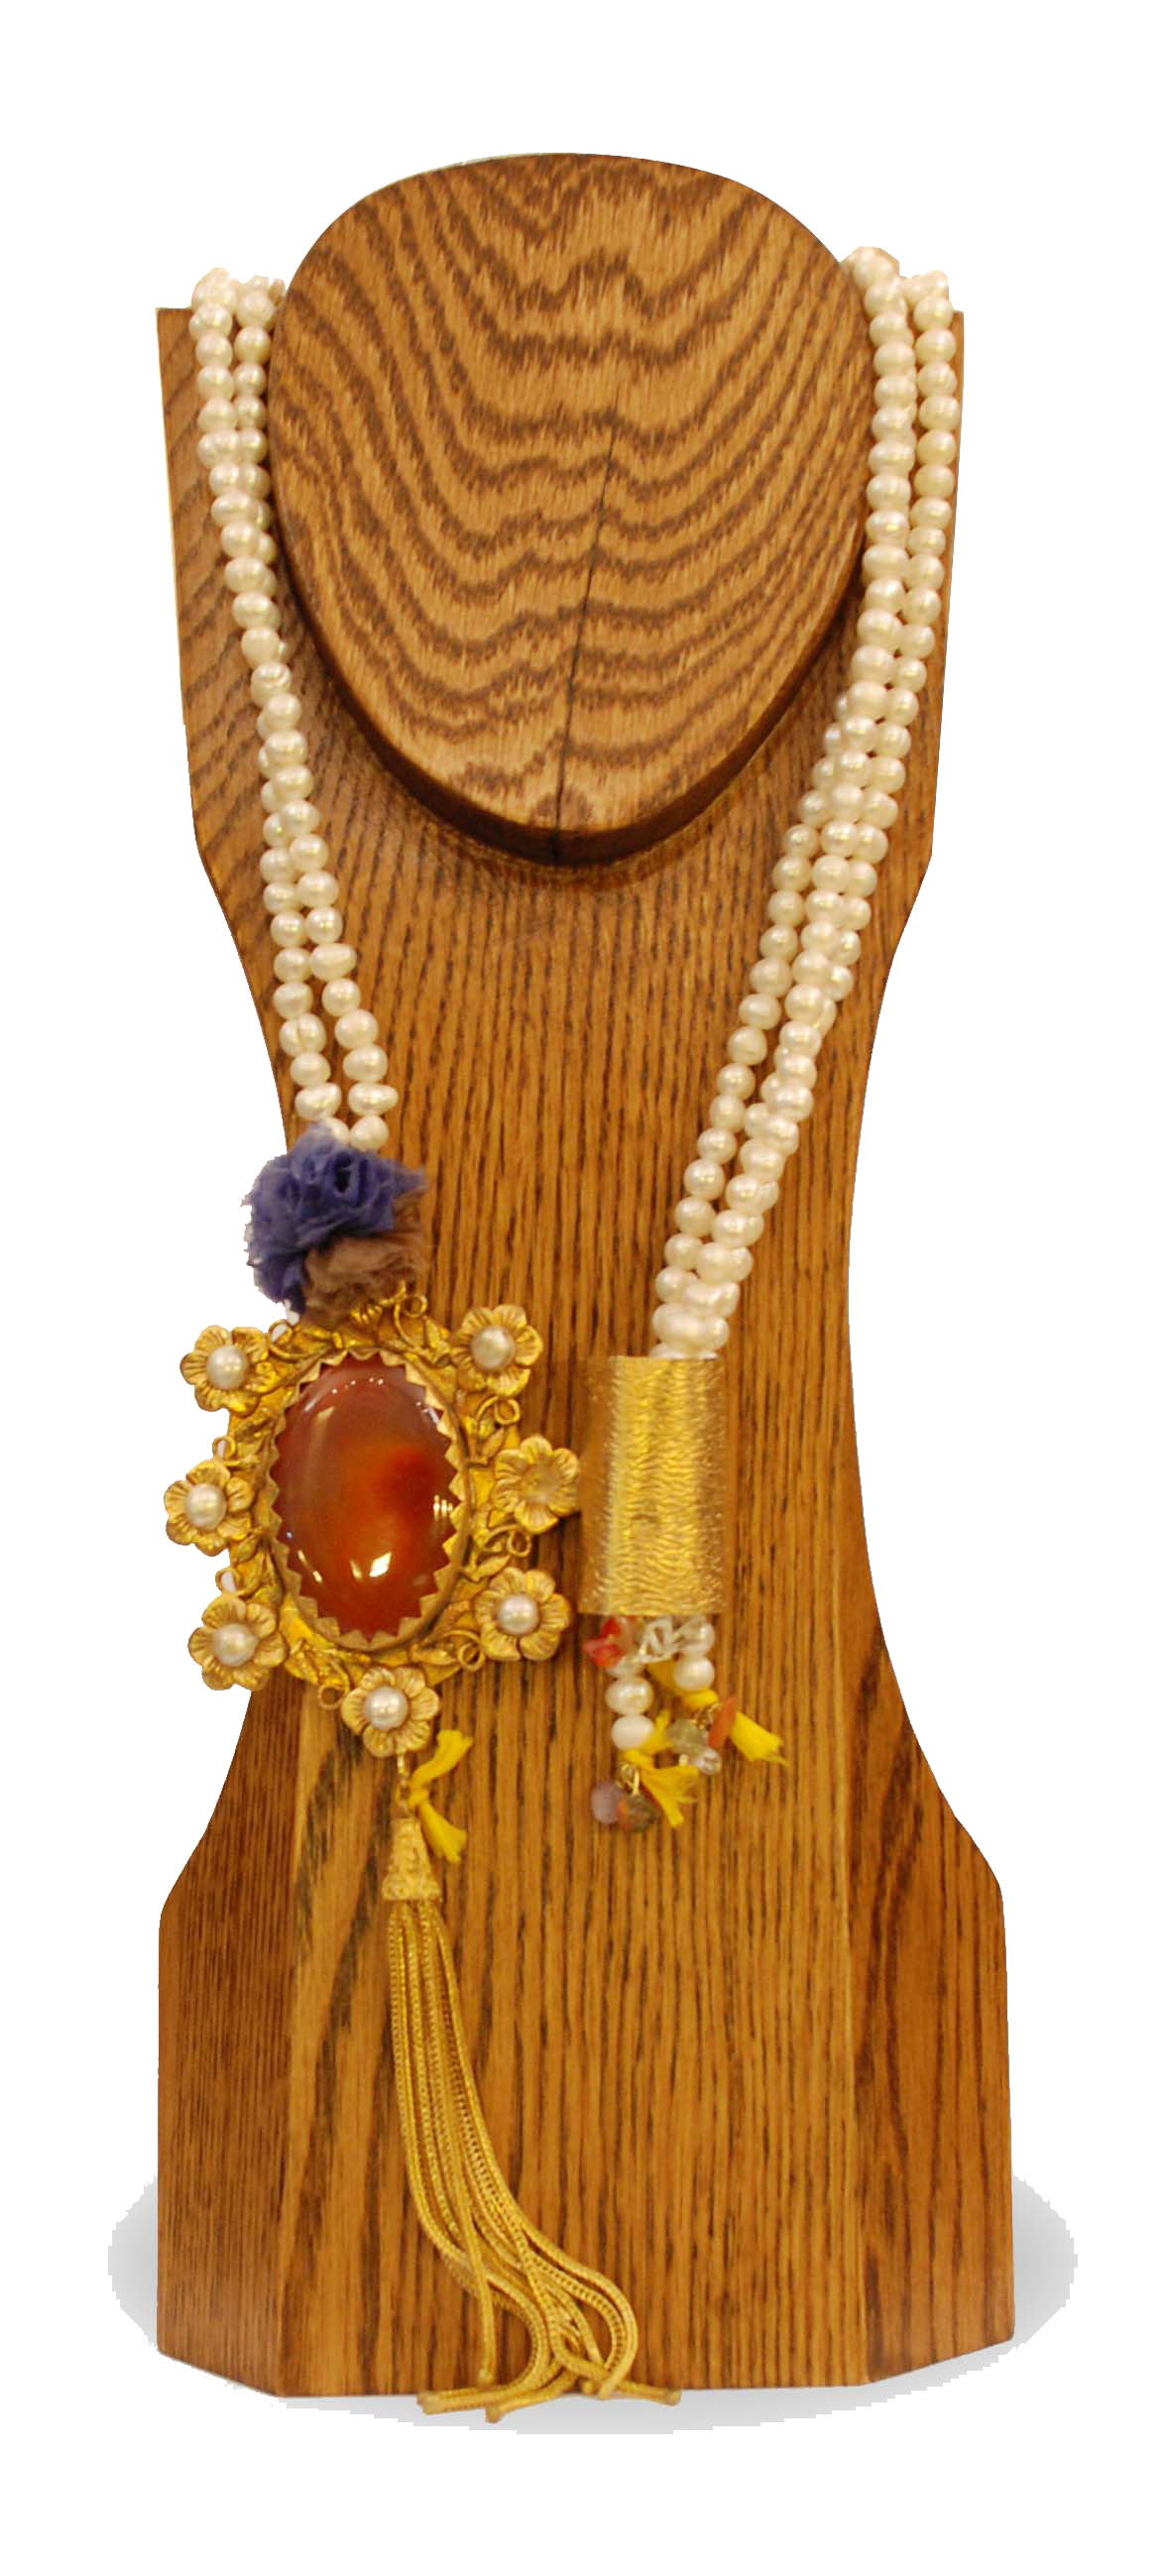 ornina handmade obizn1 pearls neck-tie